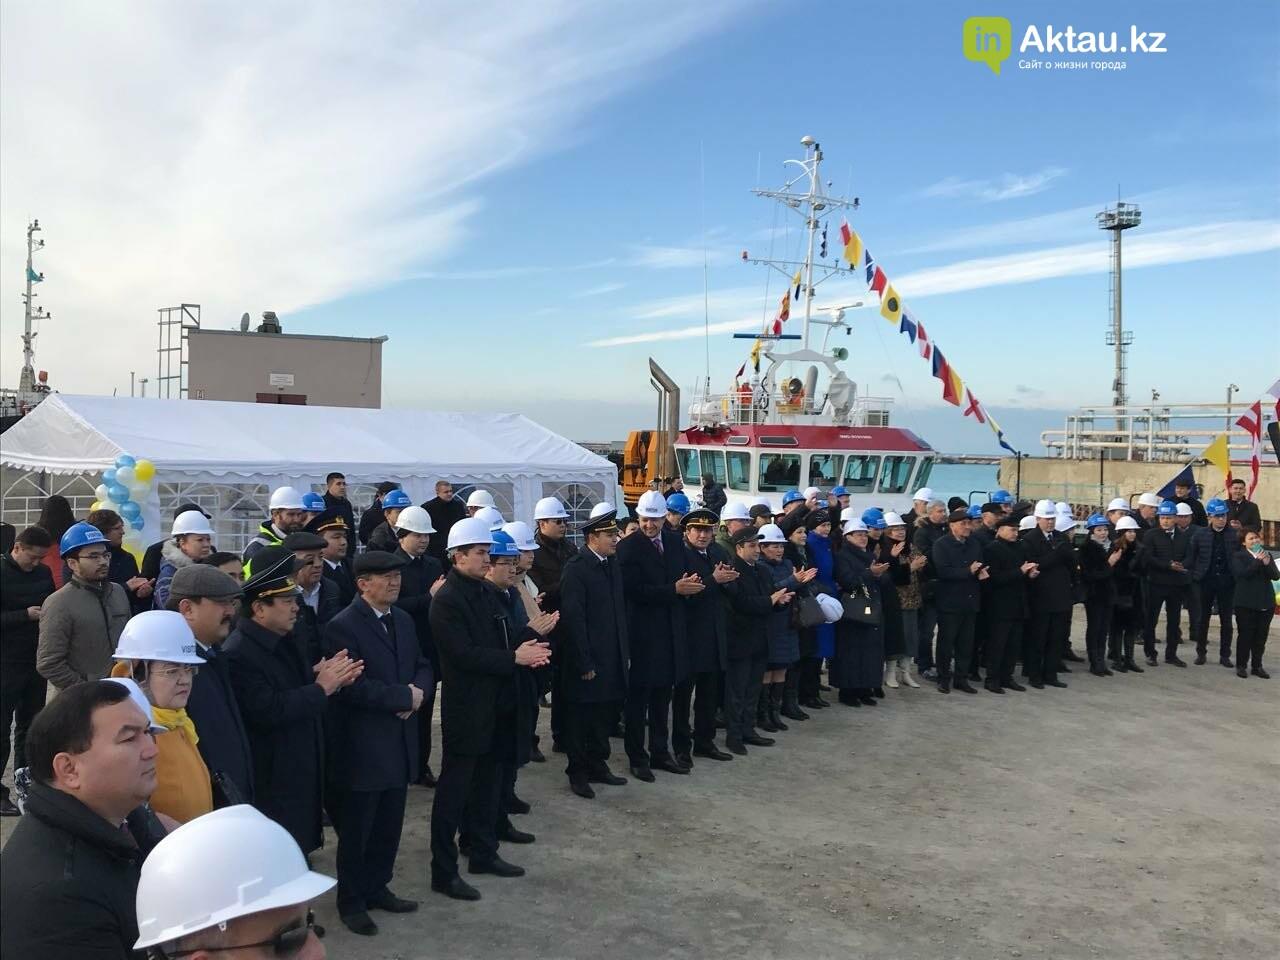 В порт Актау прибыли два новых буксира за 5 миллионов евро, фото-5